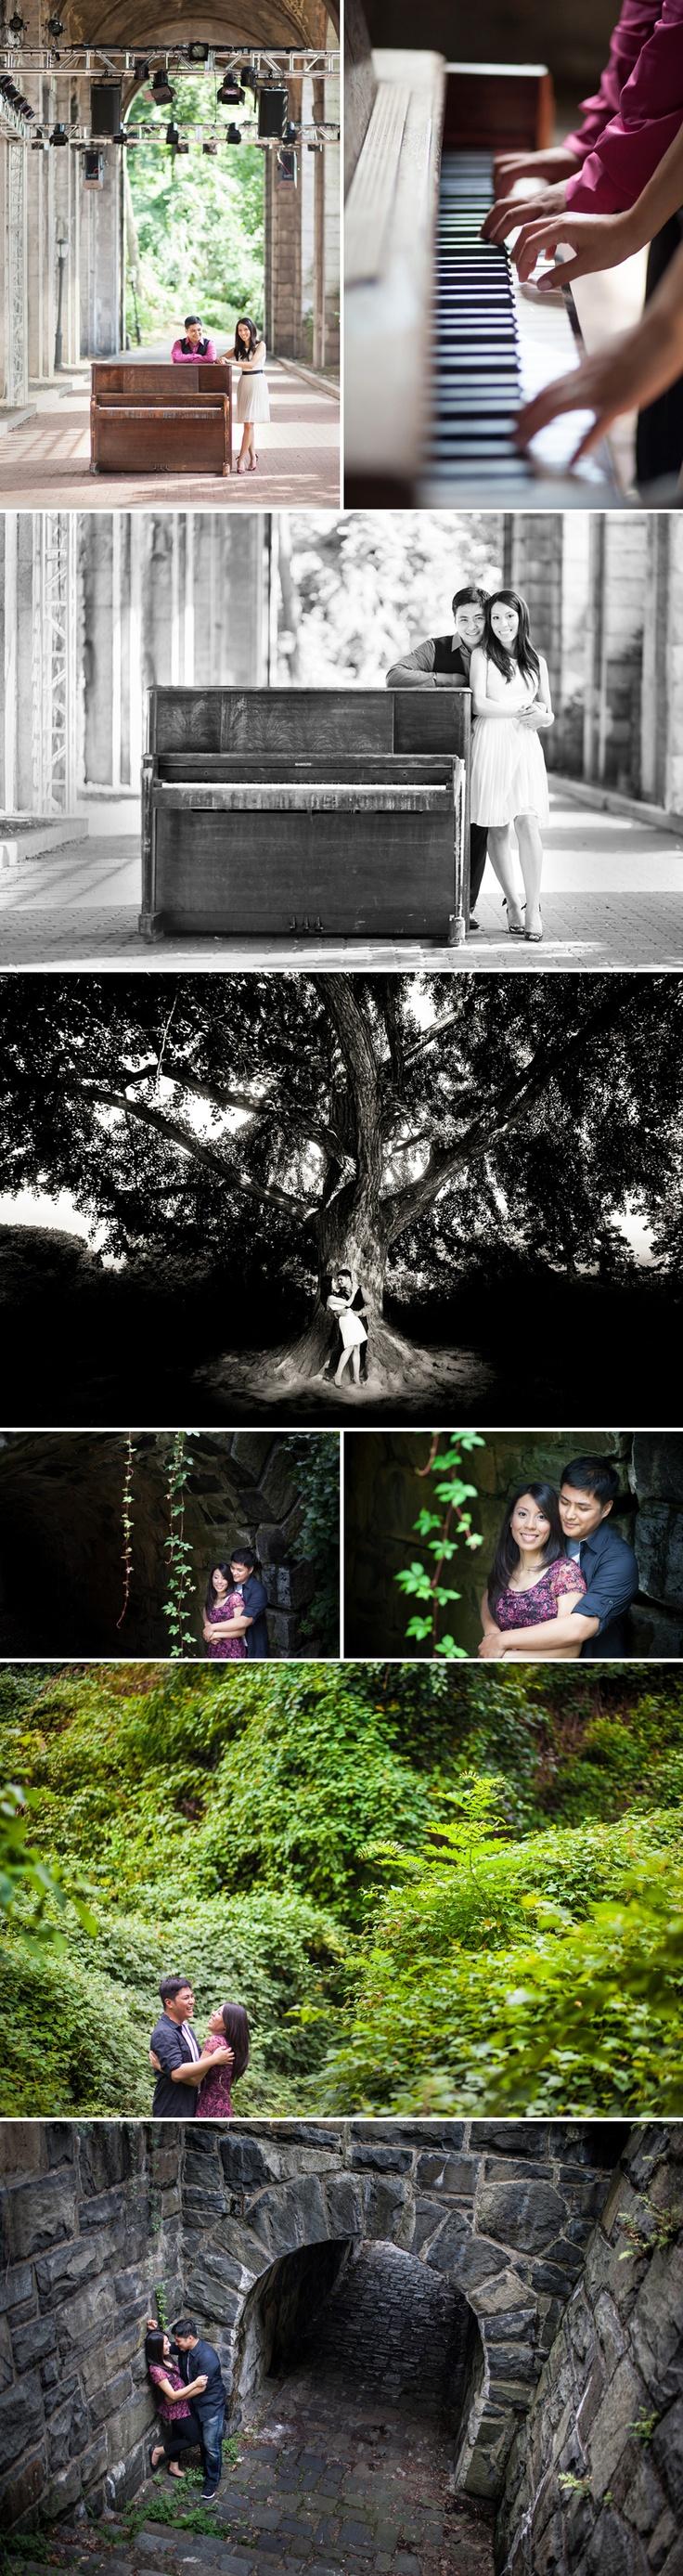 MY Engagement Session :D      with Bōm Photography – New York New Jersey Wedding Photographer 뉴욕 웨딩 사진 뉴저지 웨딩 사진 전문